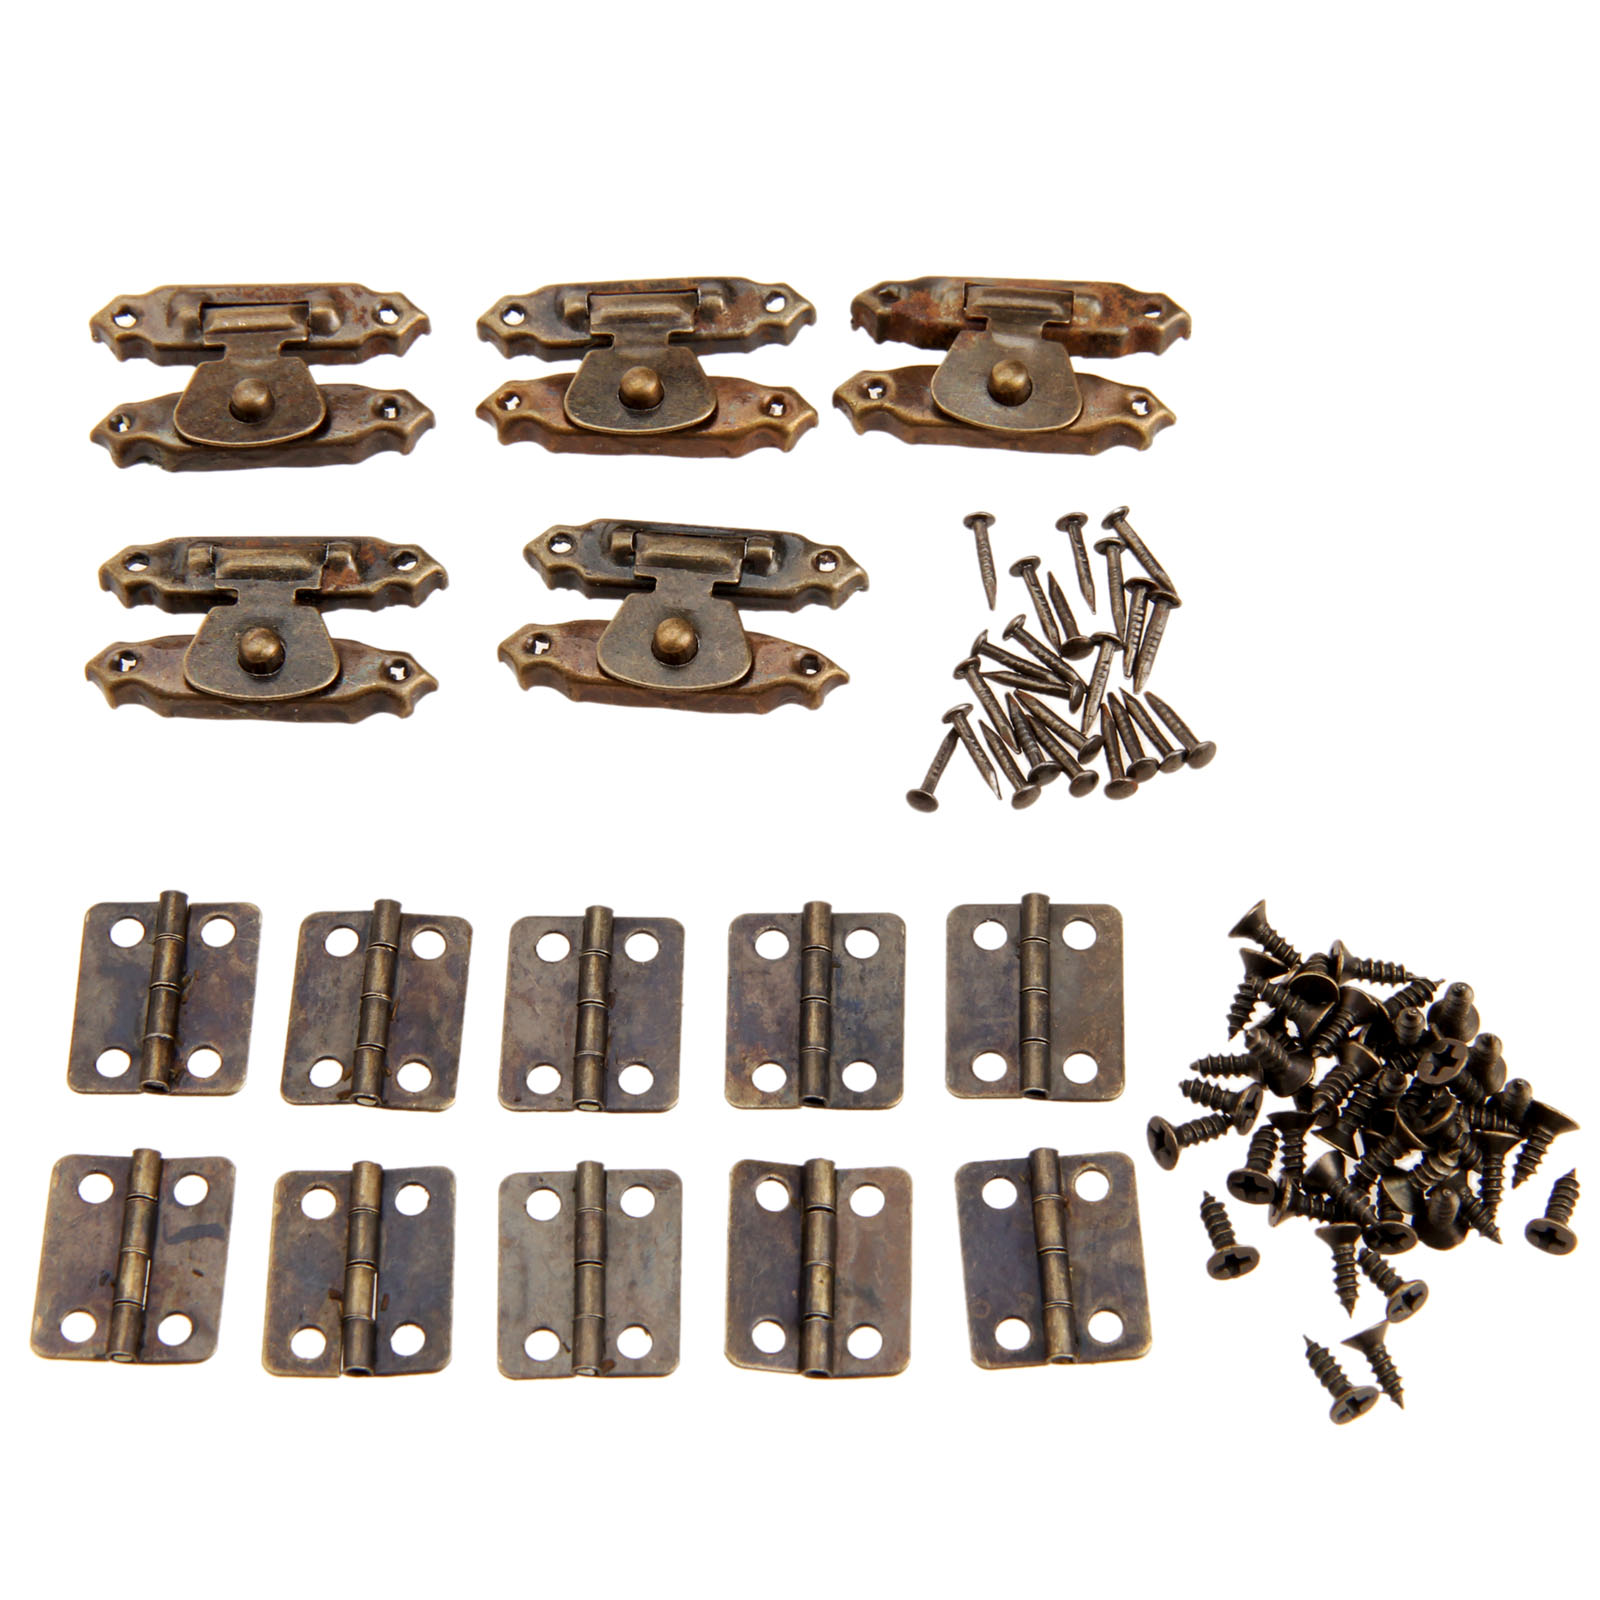 15pcs/set Antique Bronze Round Hinges Iron Decorative Vintage + Latch Hasps Jewelry Box Toggle Lock Furniture Hardware